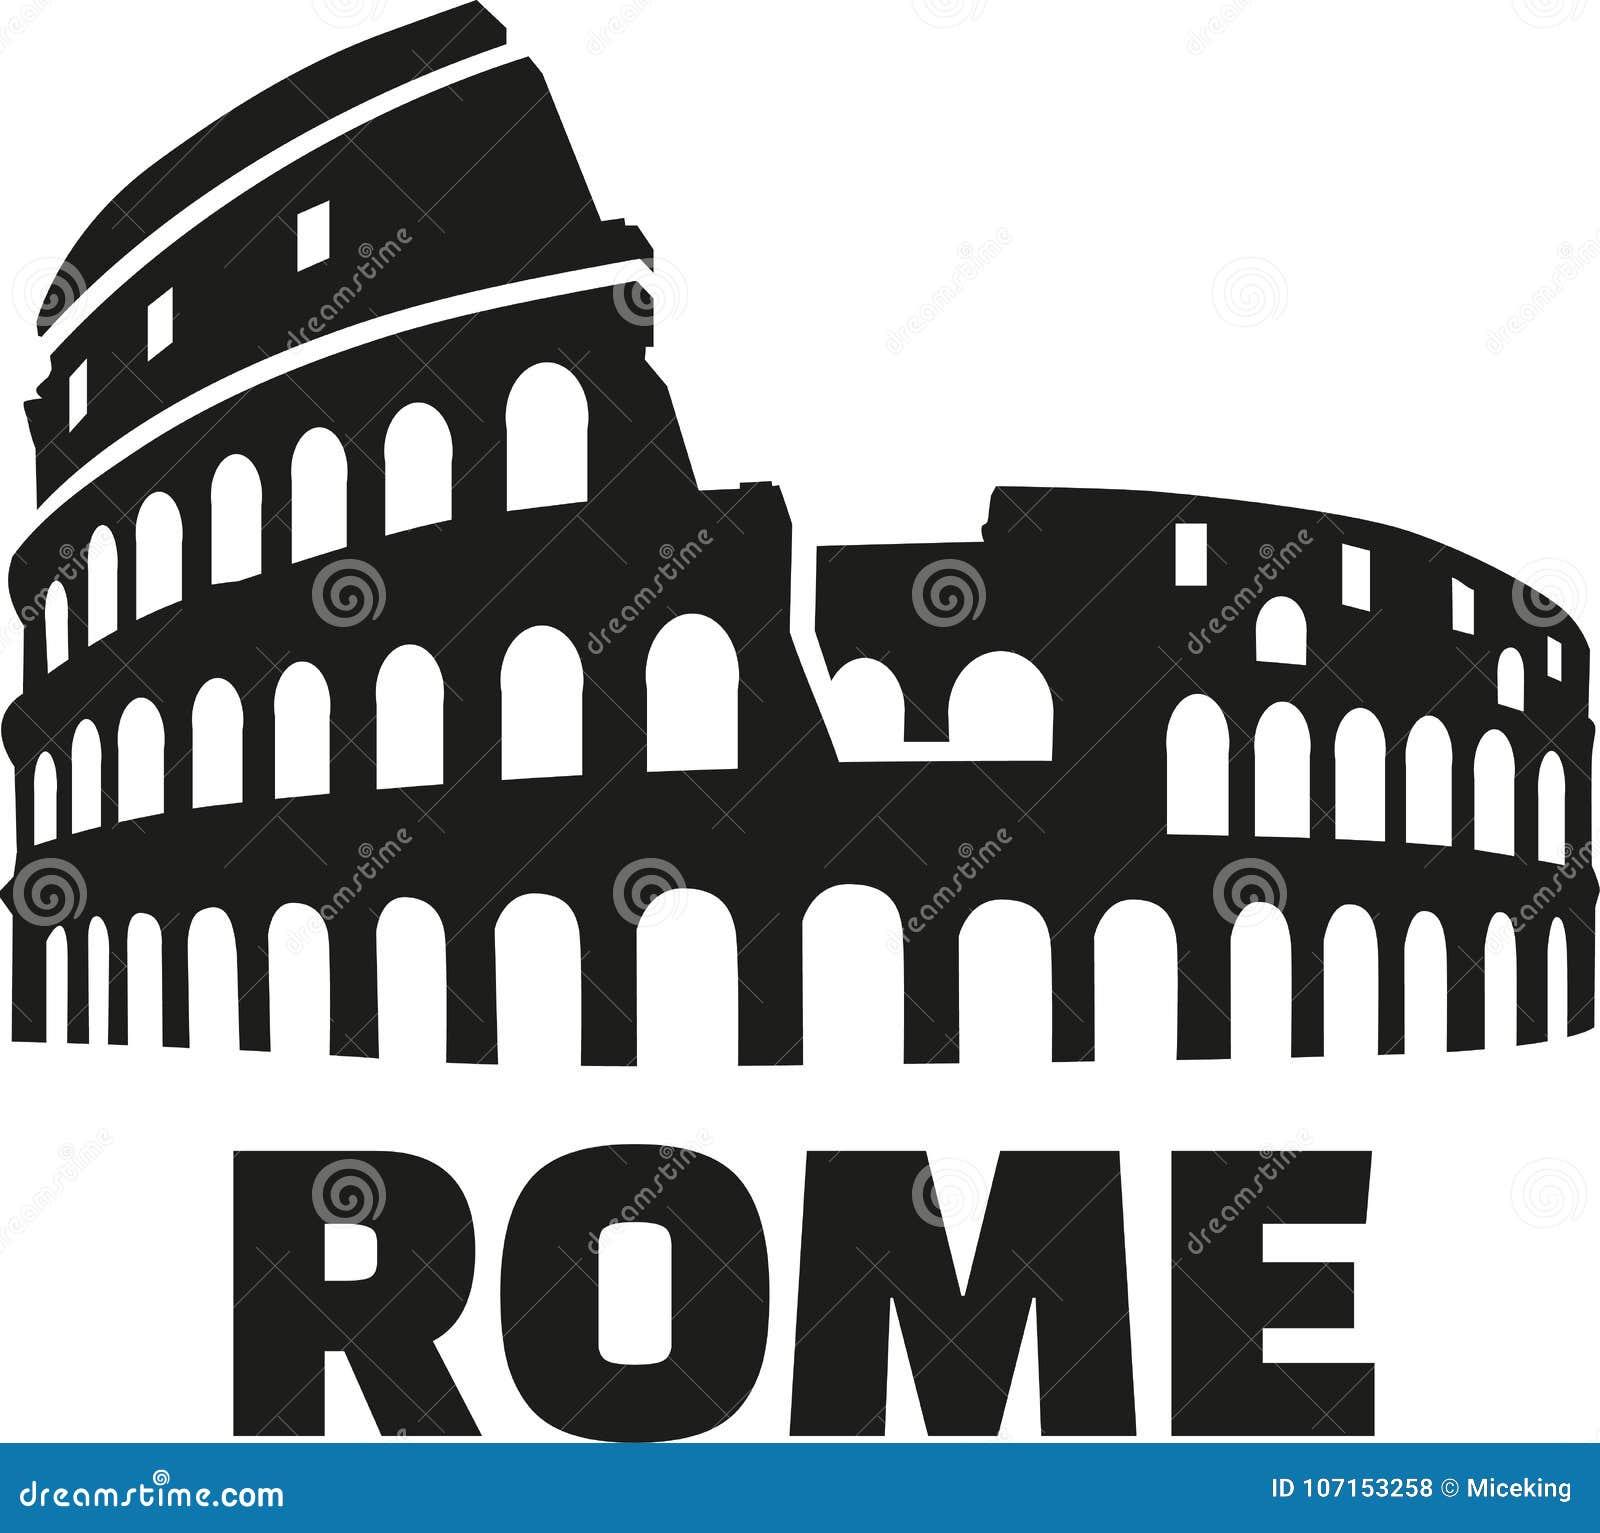 colosseum rome german stock illustration illustration of monument